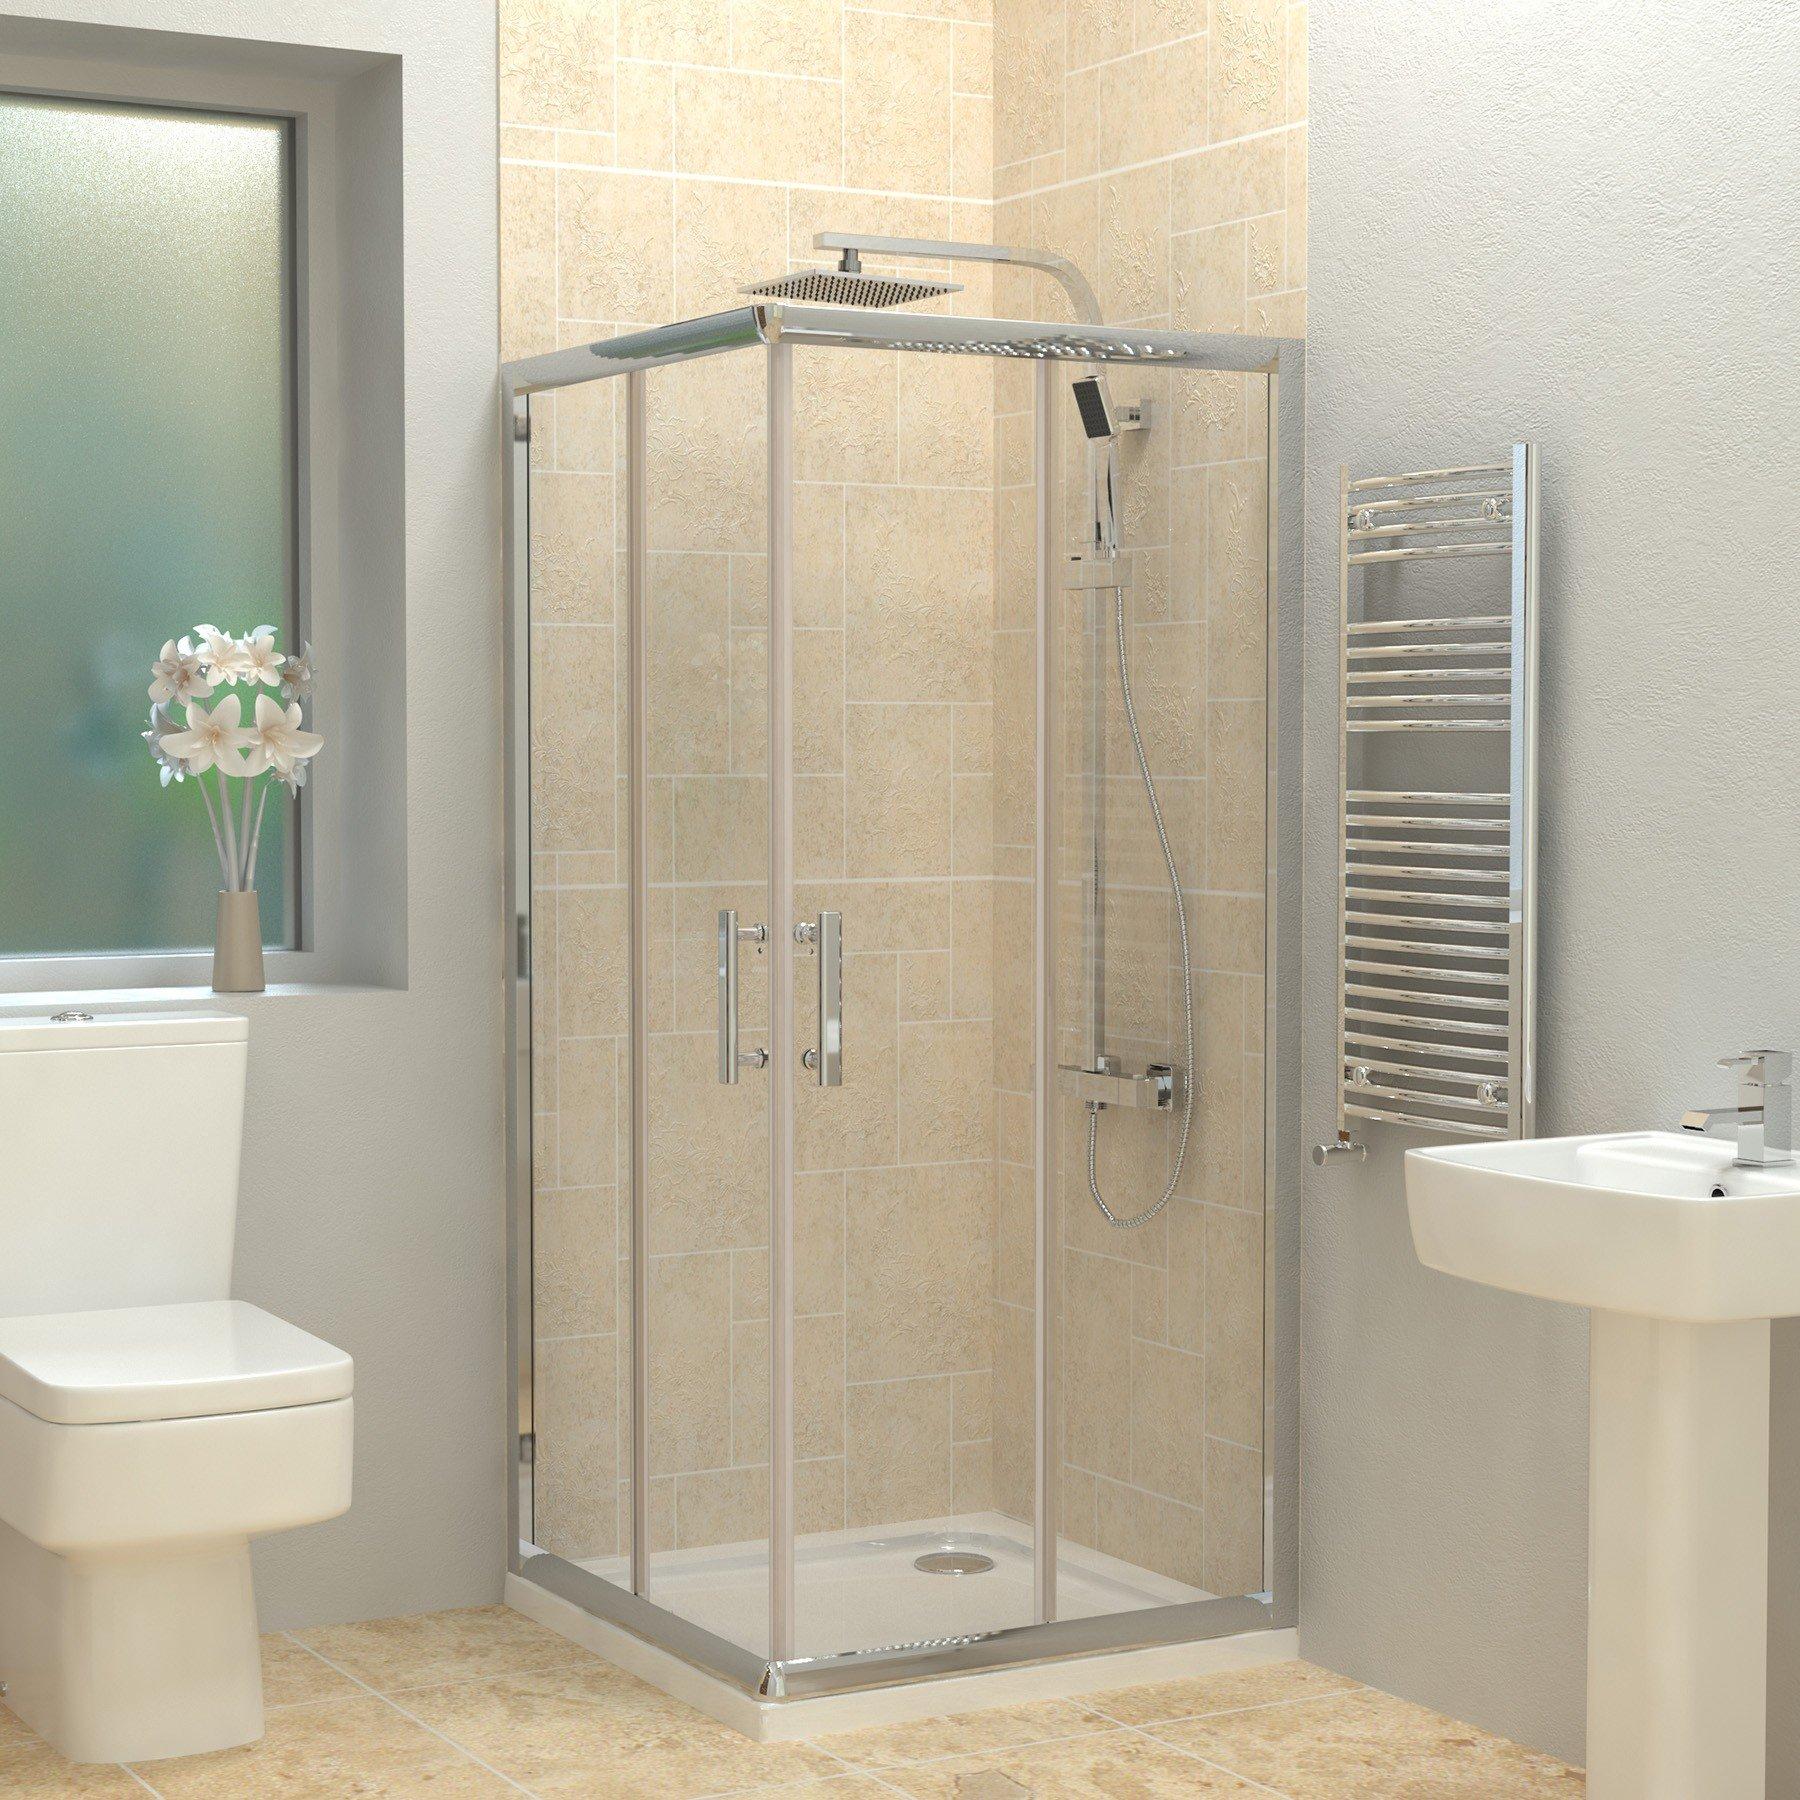 Corner Entry 6mm Glass Sliding Door Square Cubicle Shower